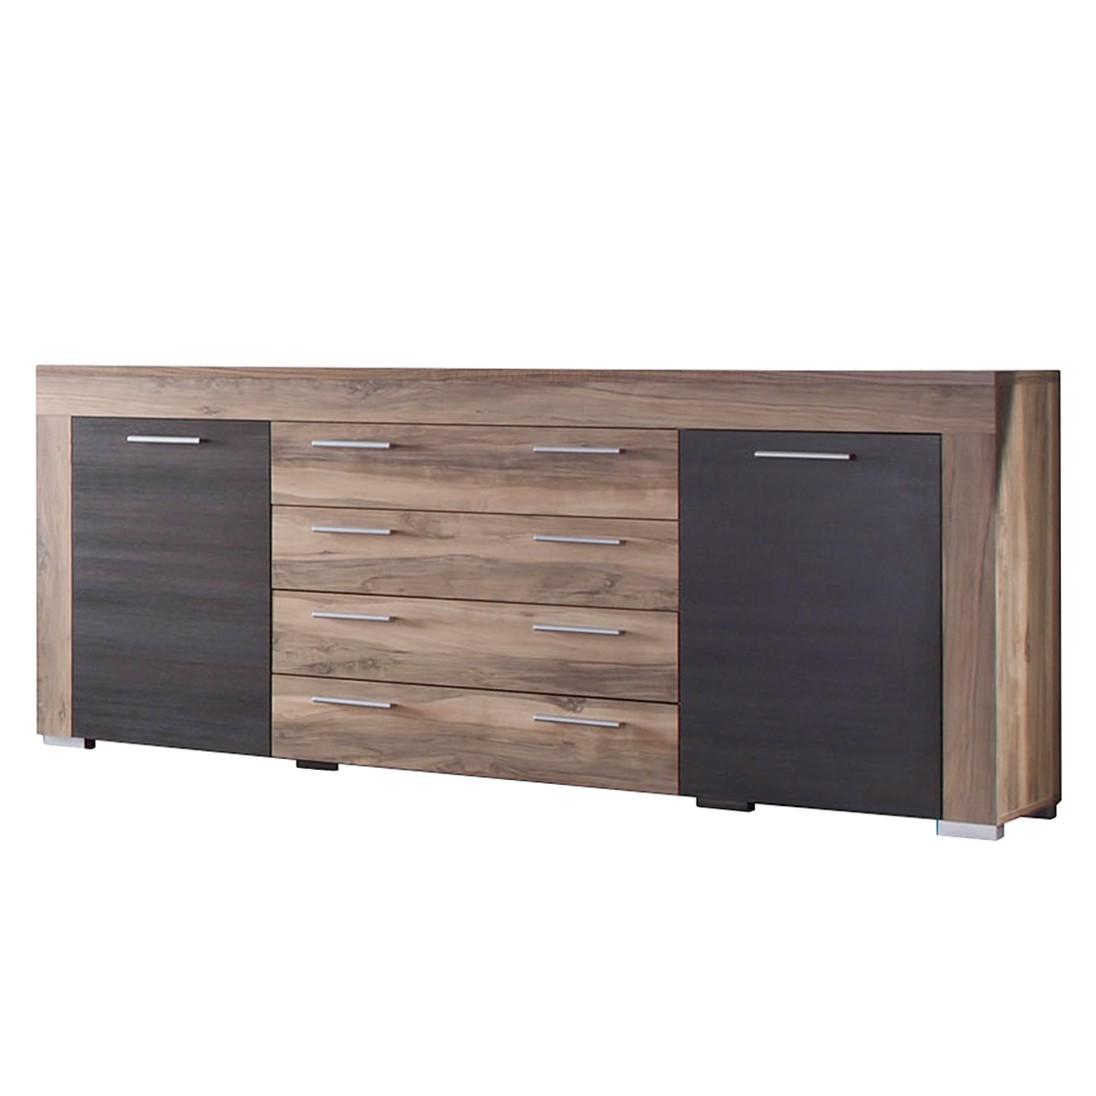 Sideboard Bang - Nussbaum-Satin/Dunkelbraun-Touchwood Dekor